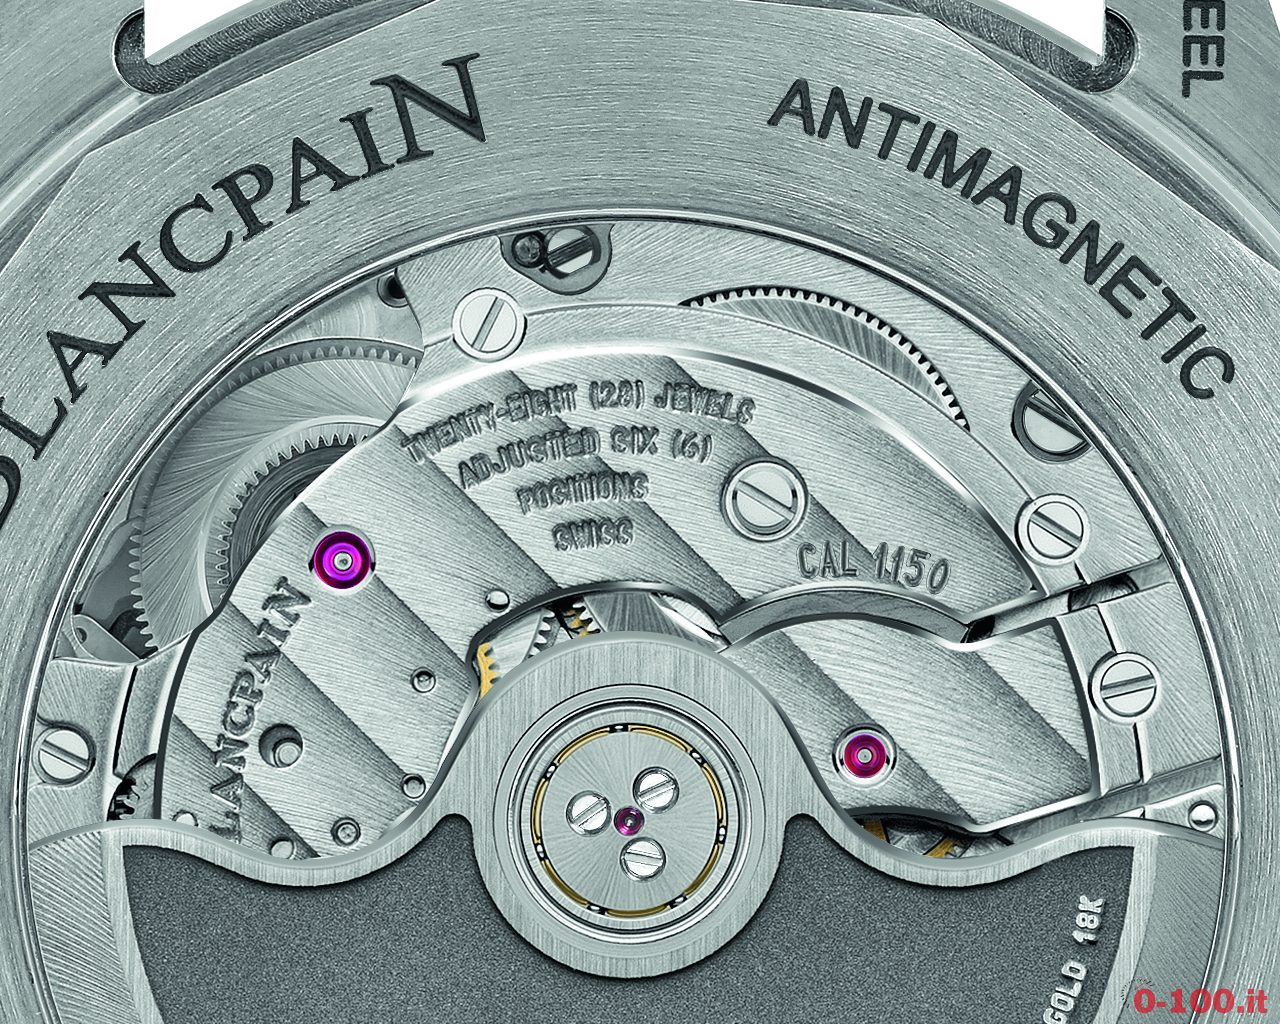 anteprima-baselworld-2017-blancpain-fifty-fathoms-bathyscaphe-ref-5100-1140-o52a-prezzo-price_0-1004